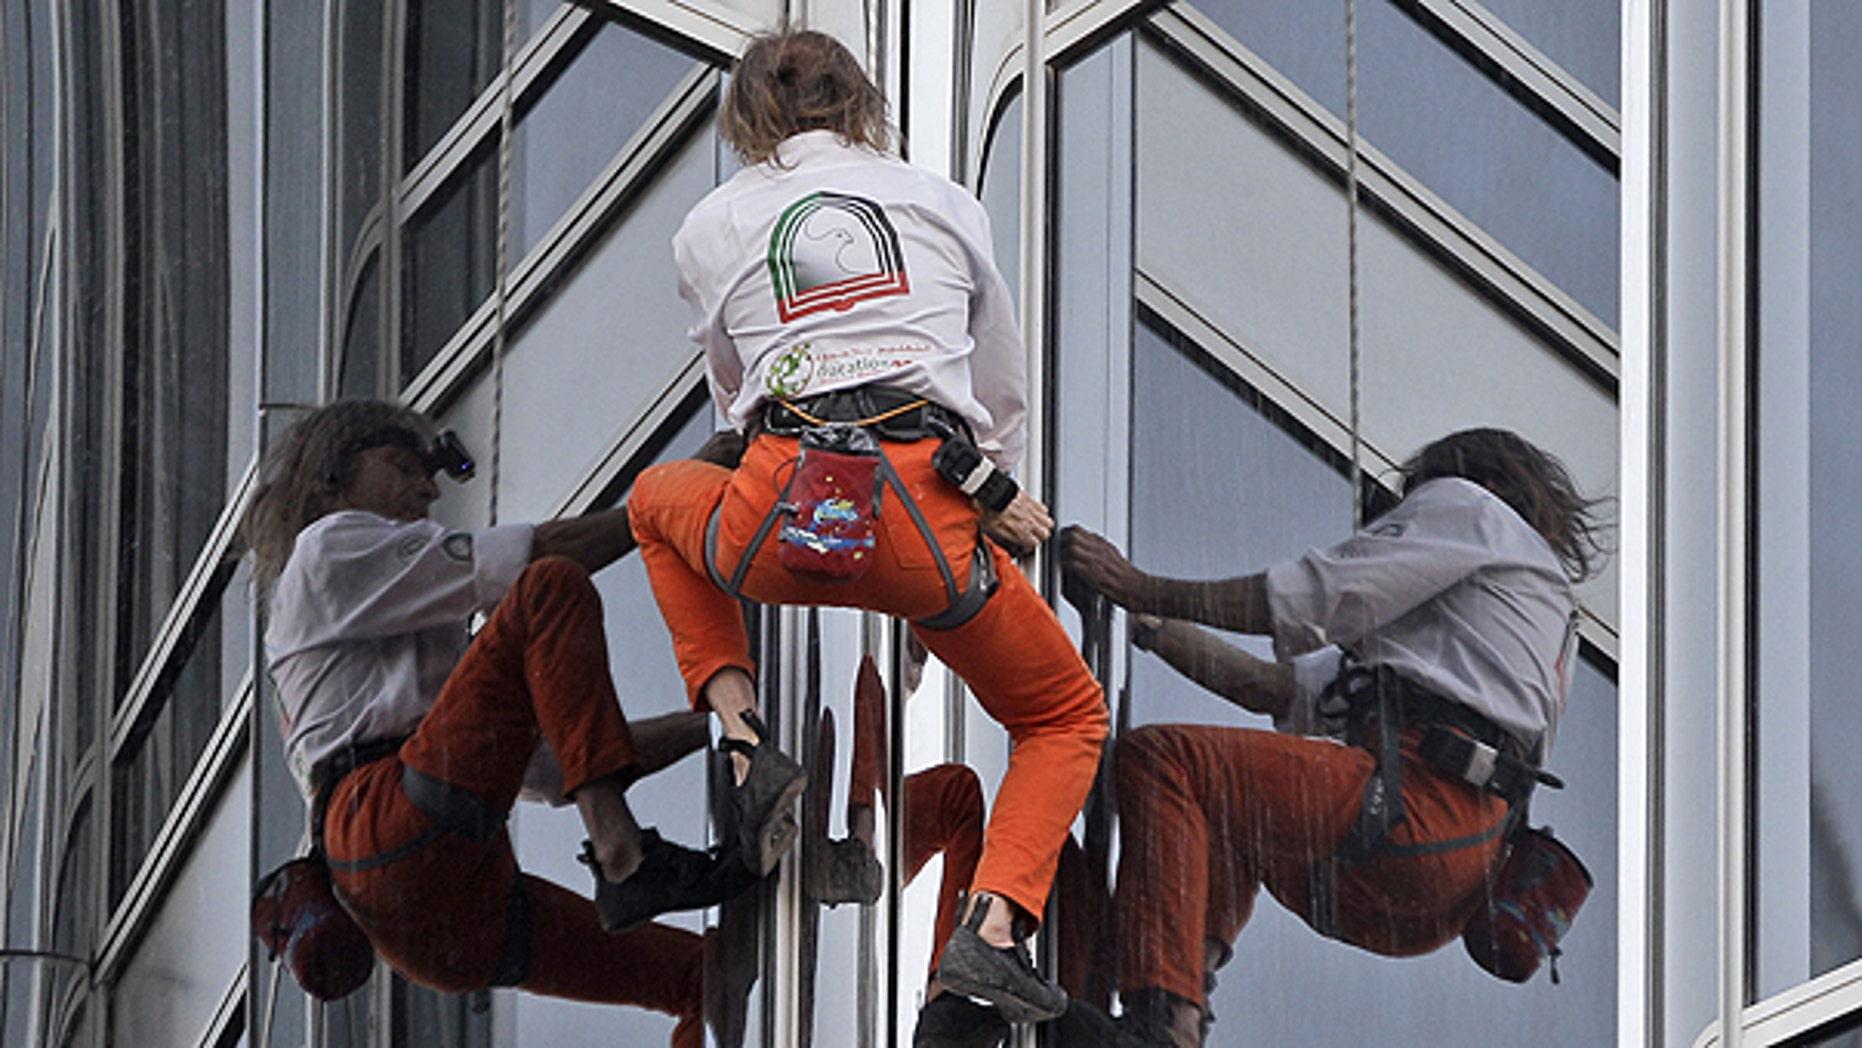 March 28: French Spider man Alain Robert climbs up Burj Khalifa, the world's tallest tower in Dubai, United Arab Emirates.